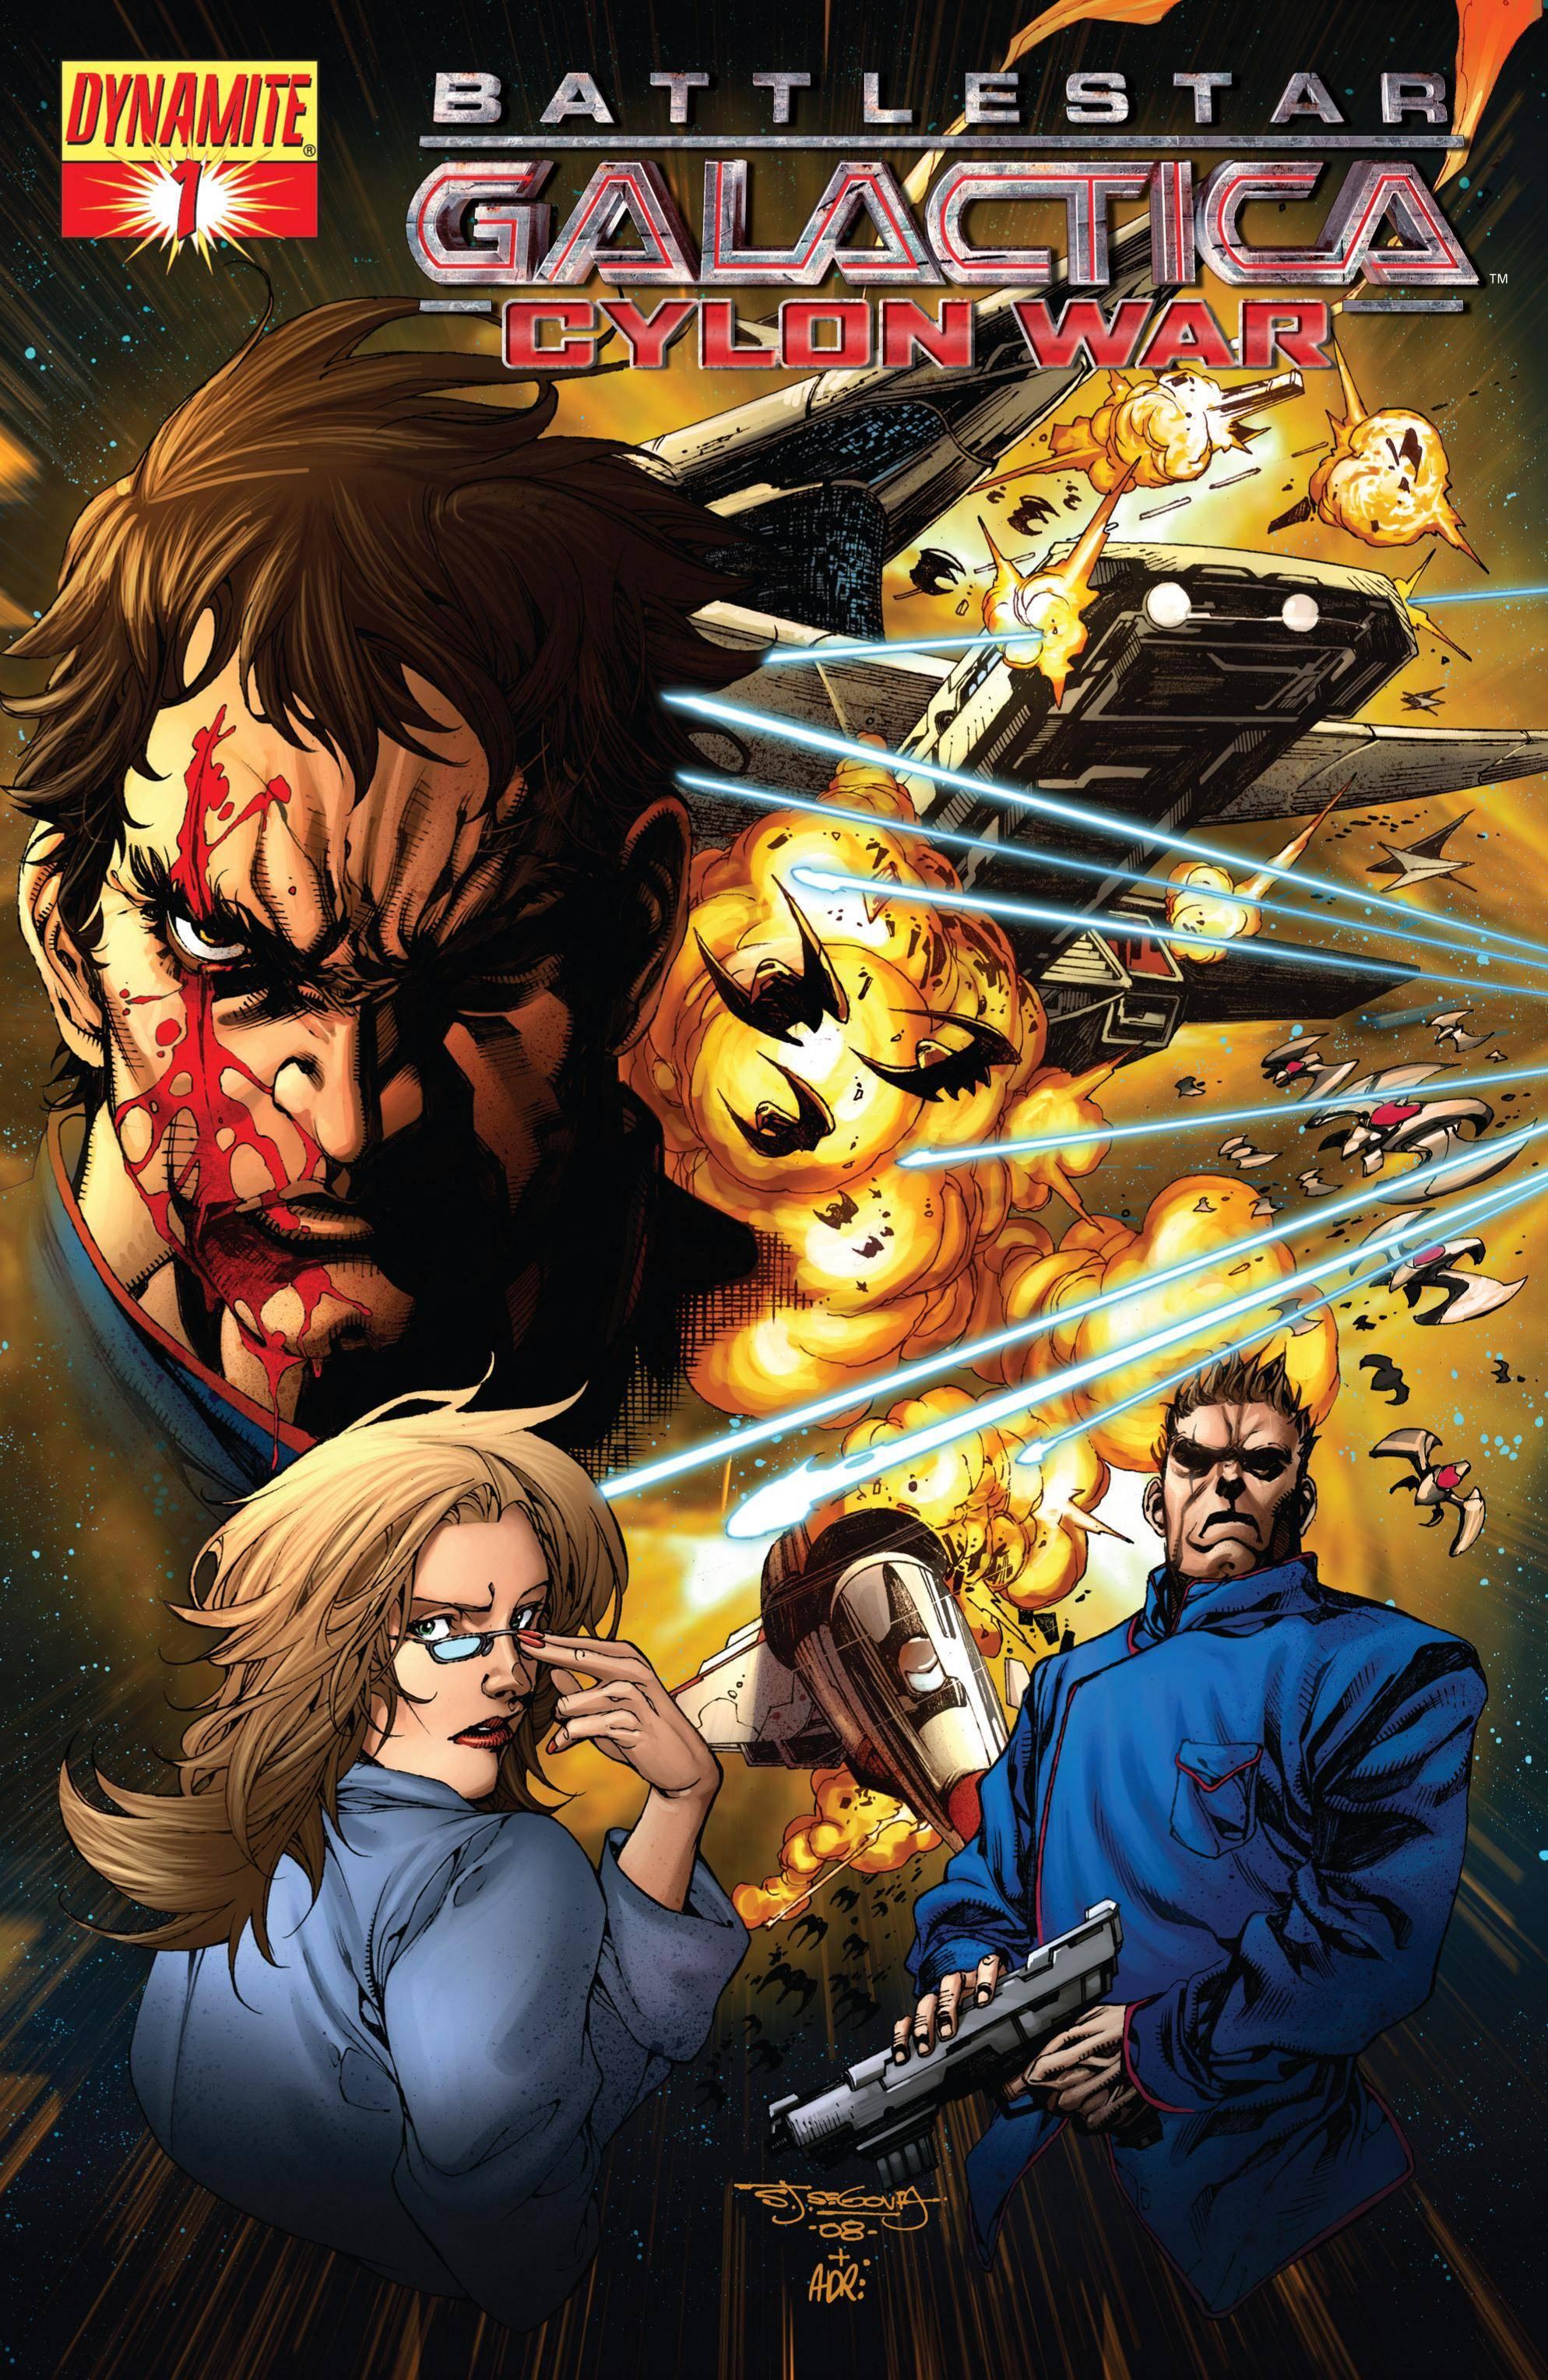 Battlestar Galactica - Cylon War 001 2009 2 covers digital